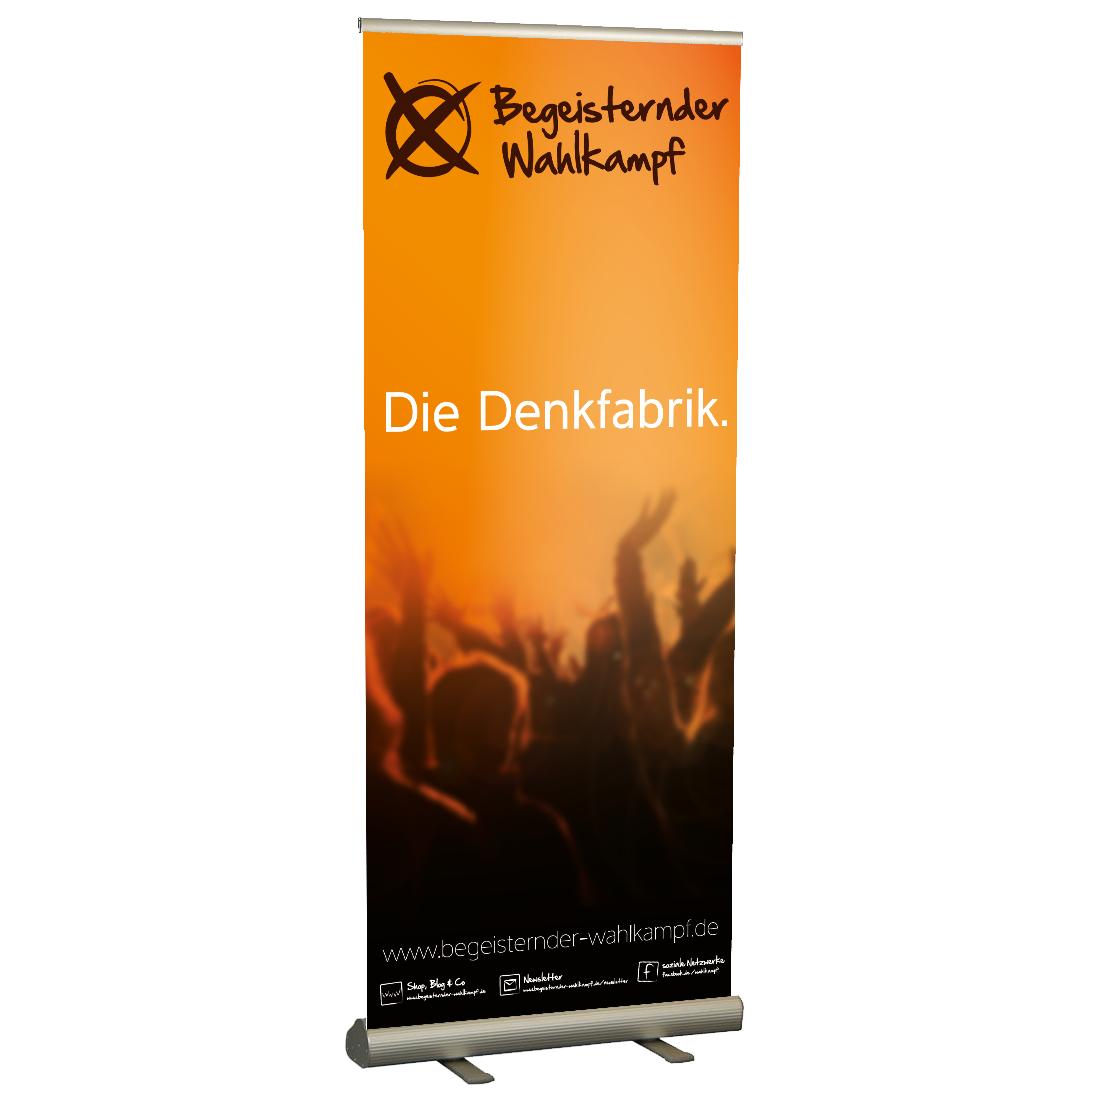 Rollup-Display - Begeisternder-Wahlkampf.de